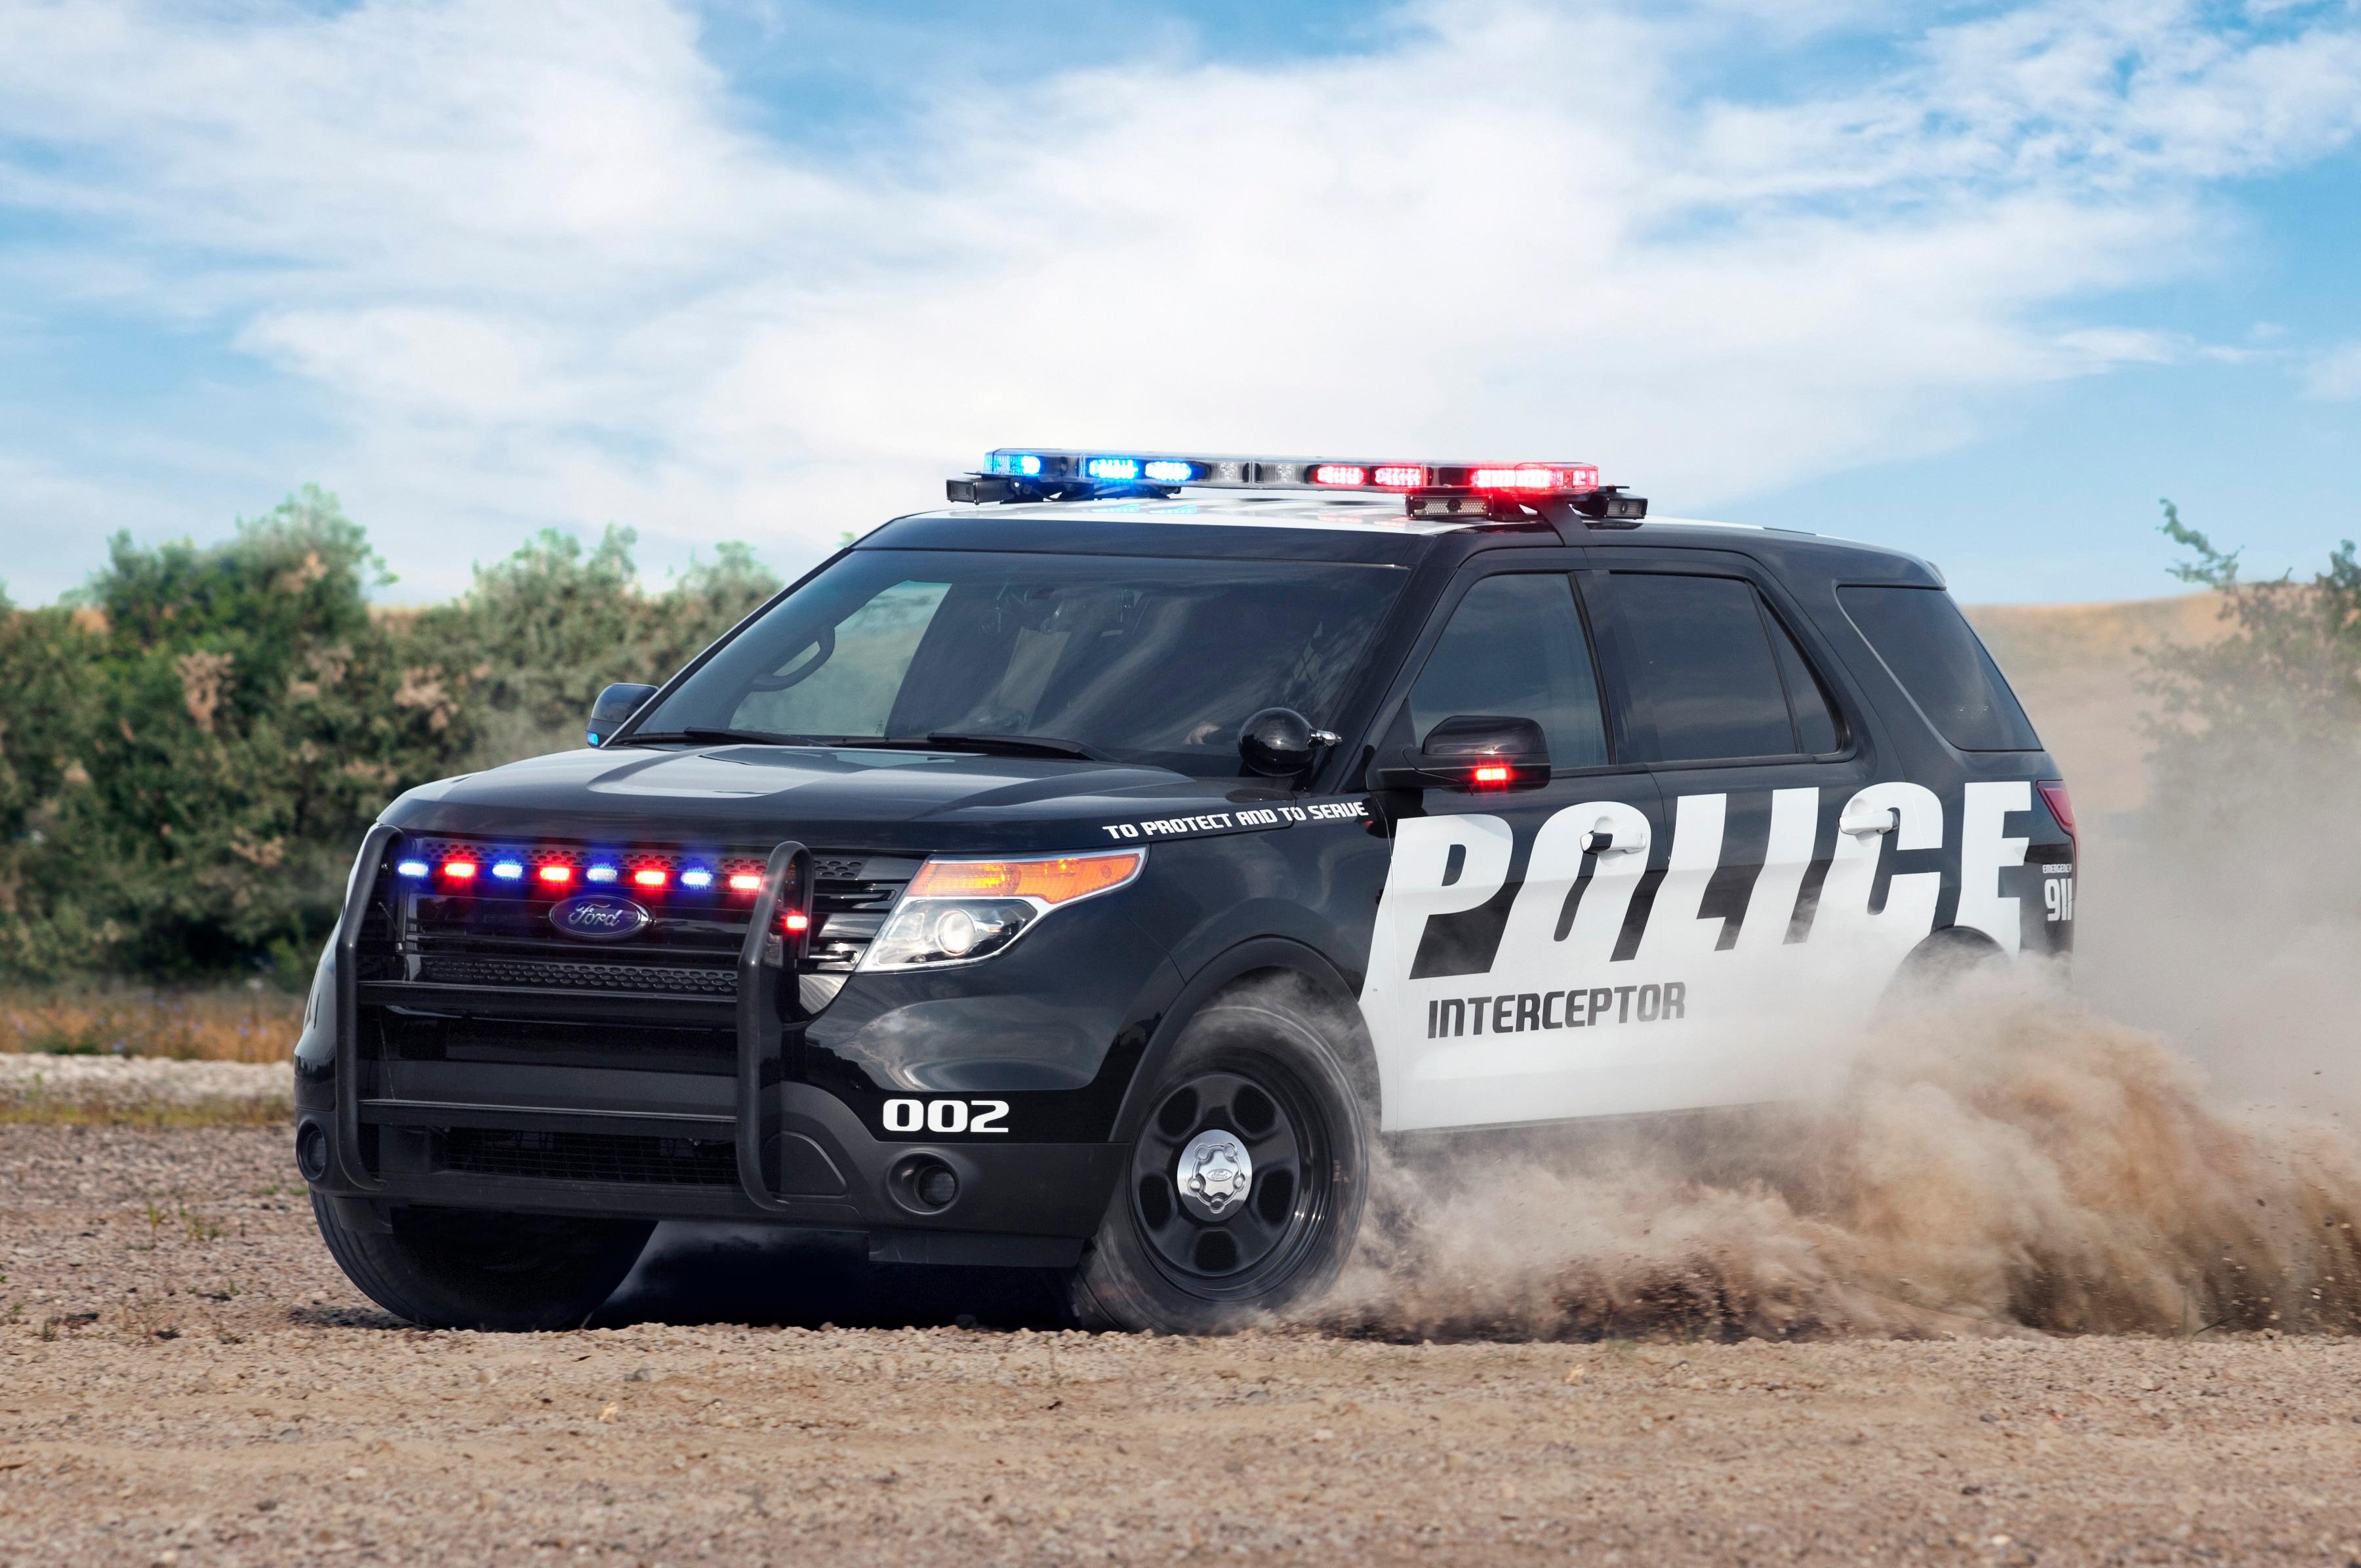 2014 Ford Police Interceptor Utility Gains EcoBoost Option